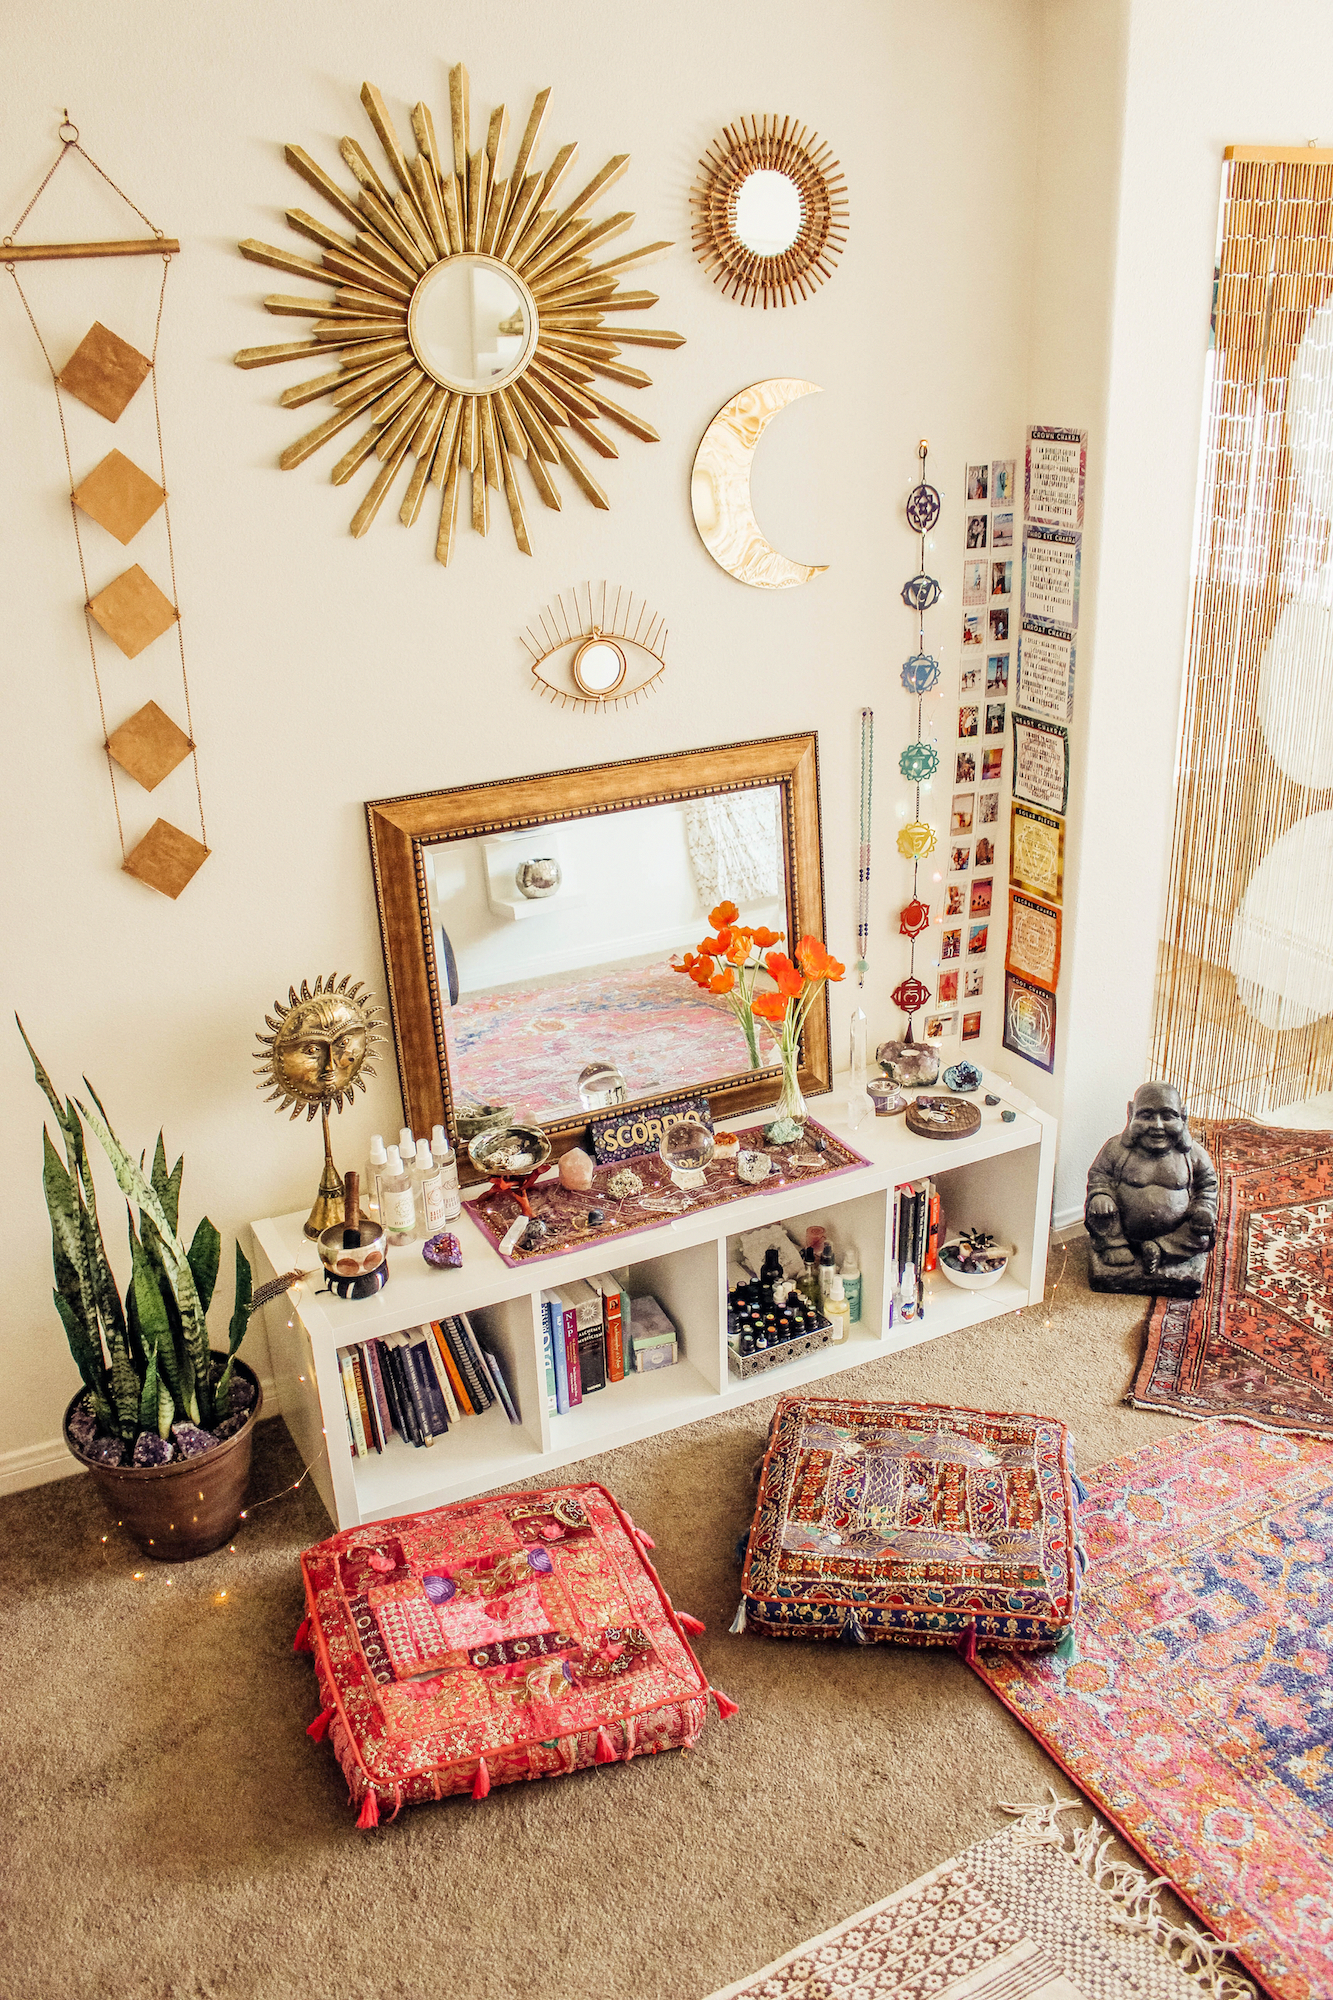 Contact Us Today Conferred Boho Decor Ideas Yoga Room Design Meditation Room Decor Home Yoga Room